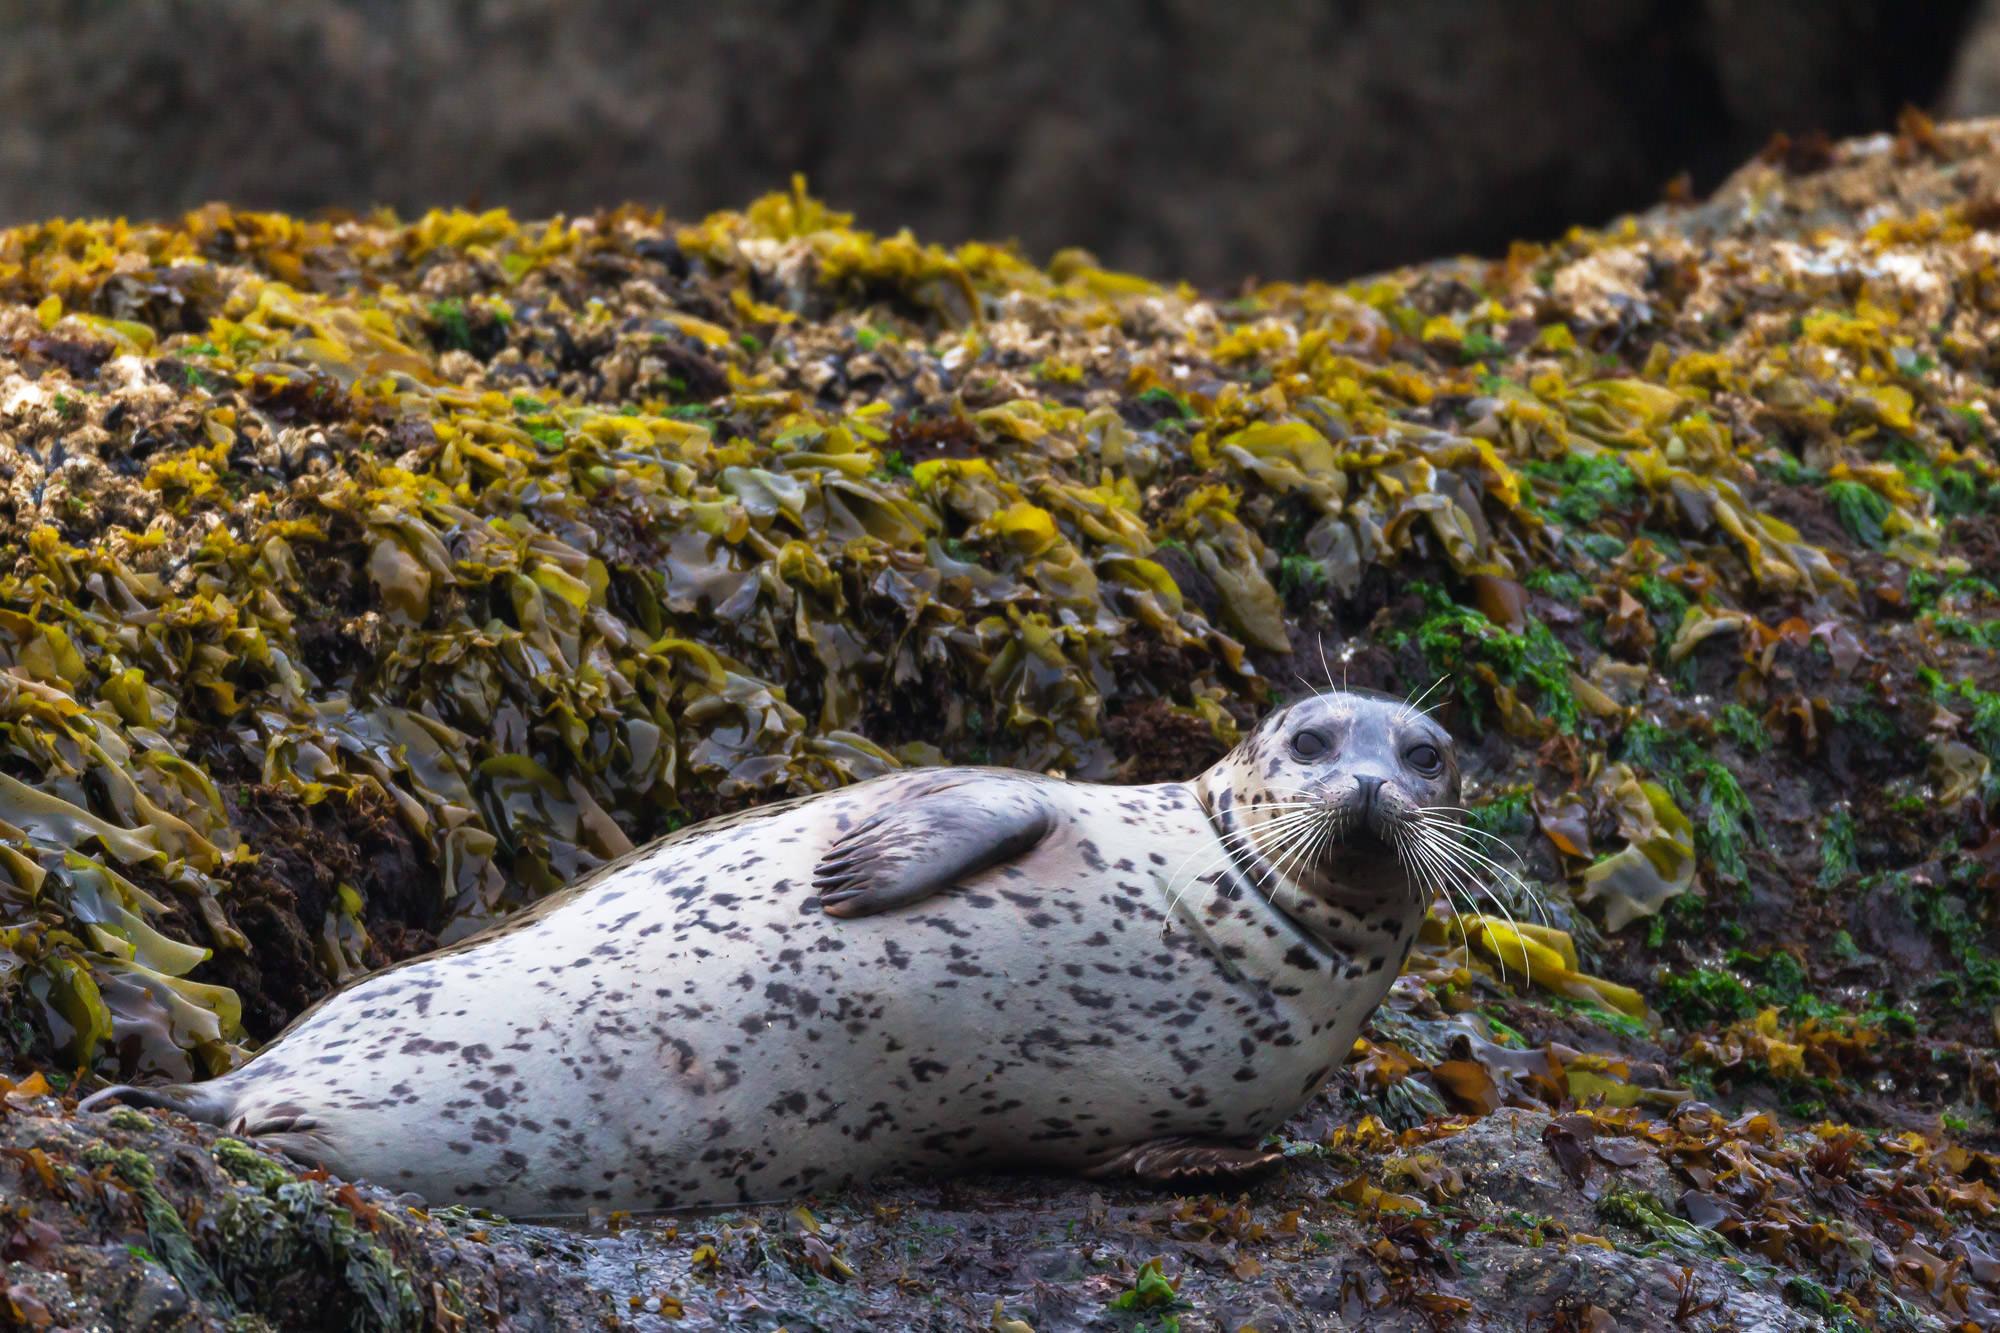 Seal, Harbor Seal, Oregon, Yaquina, limited edition, photograph, fine art, wildlife, photo